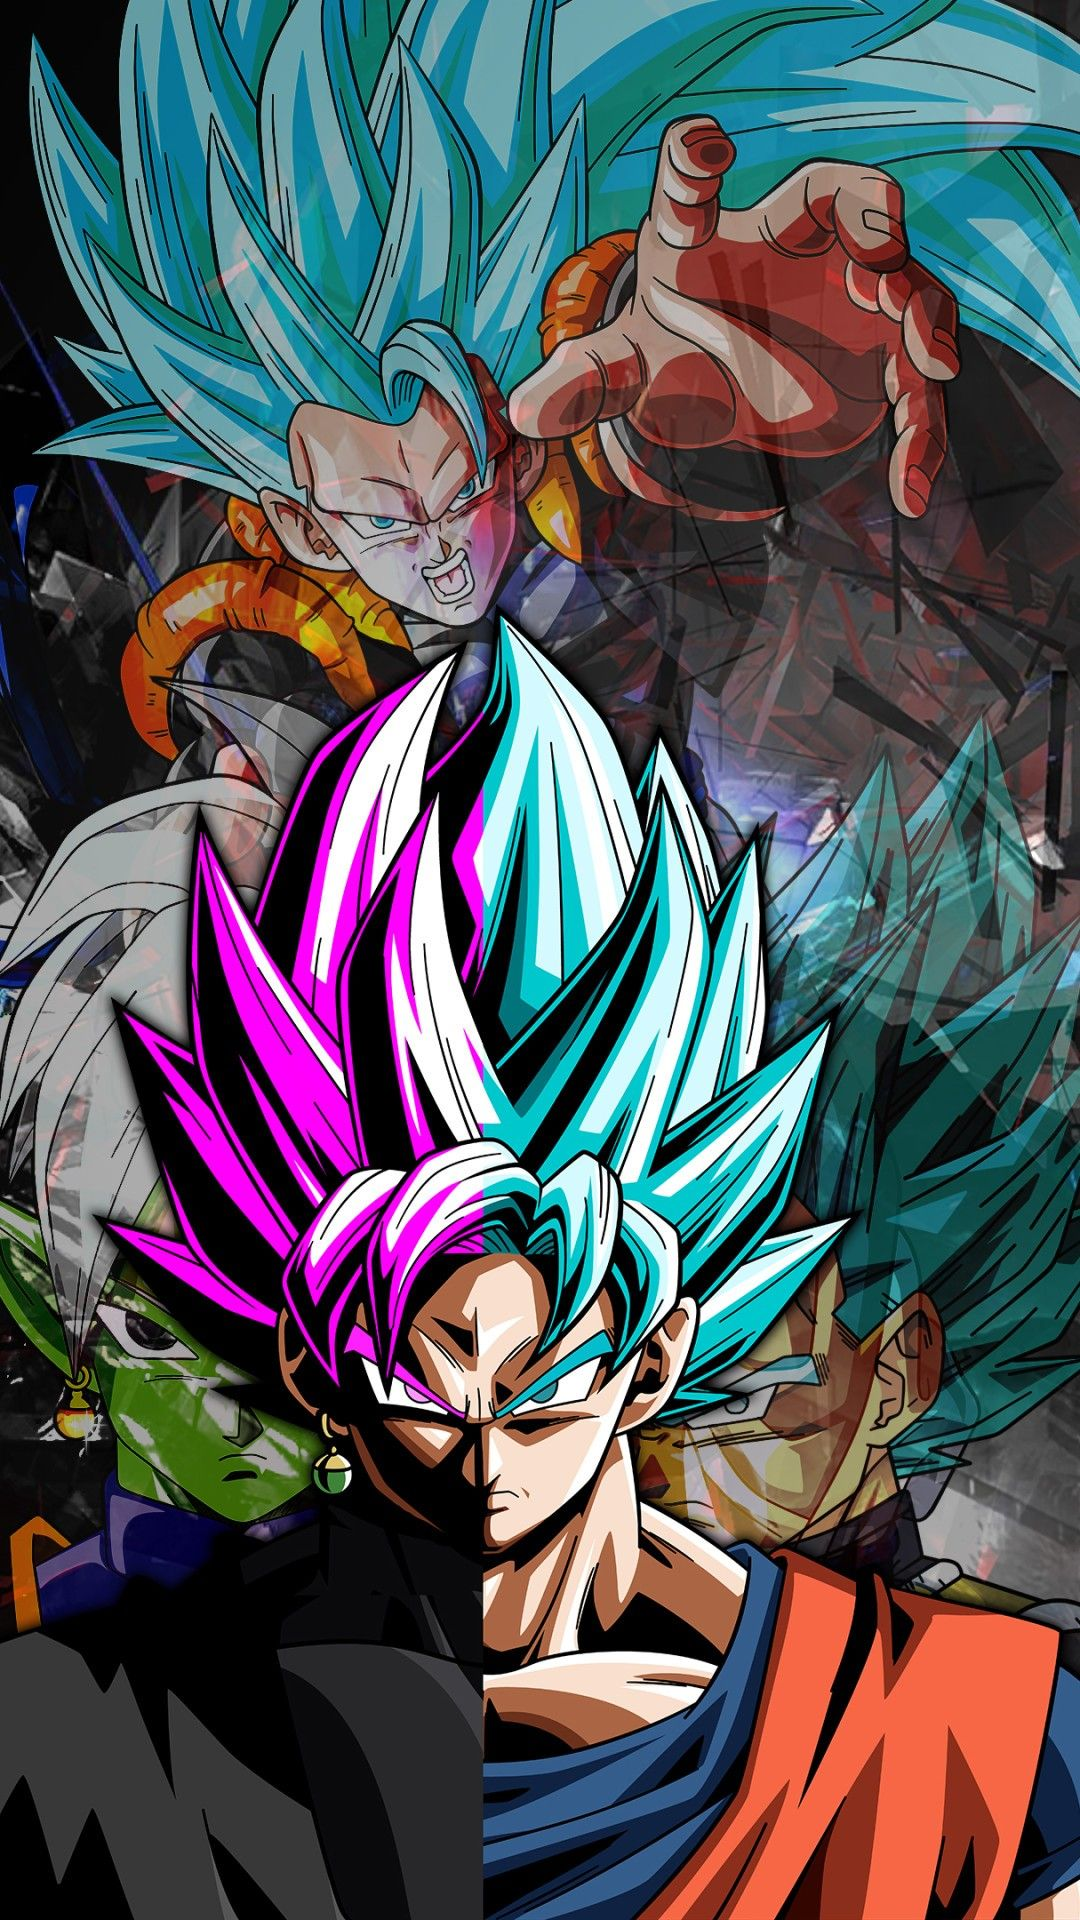 Goku Iphone Background in 2020 Dragon ball wallpaper